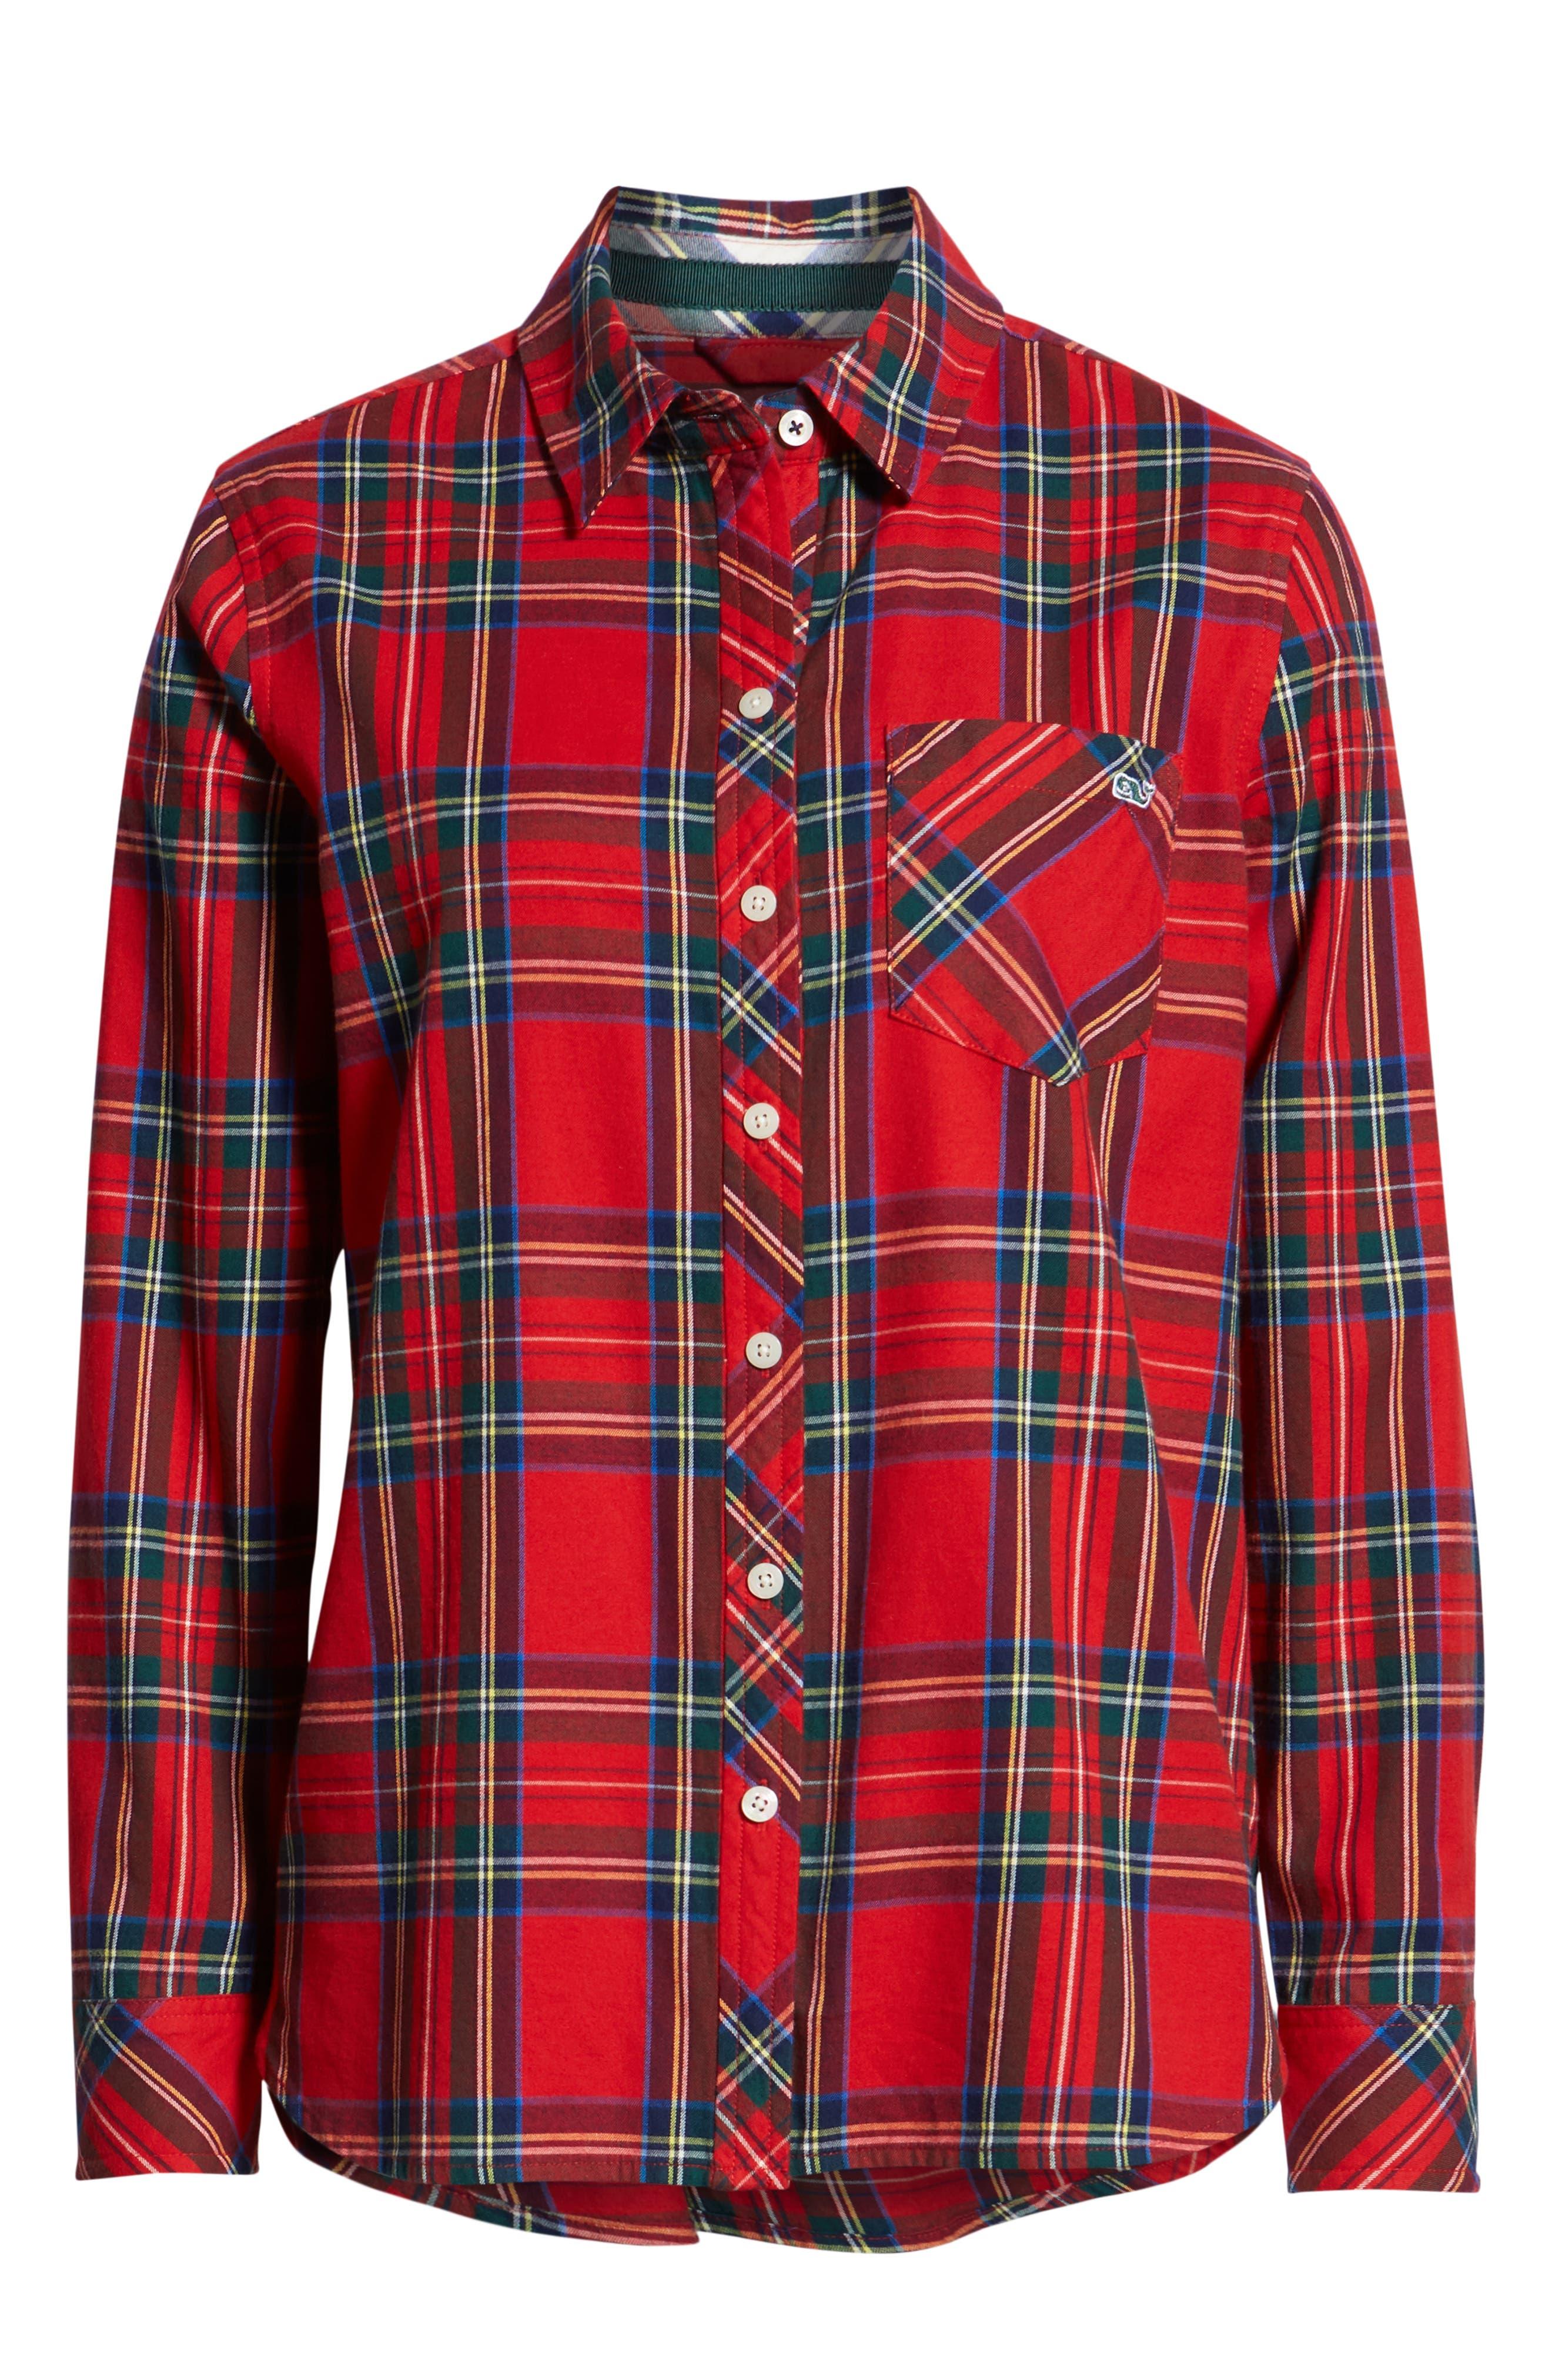 Morgan Jolly Plaid Flannel Shirt,                             Alternate thumbnail 6, color,                             600